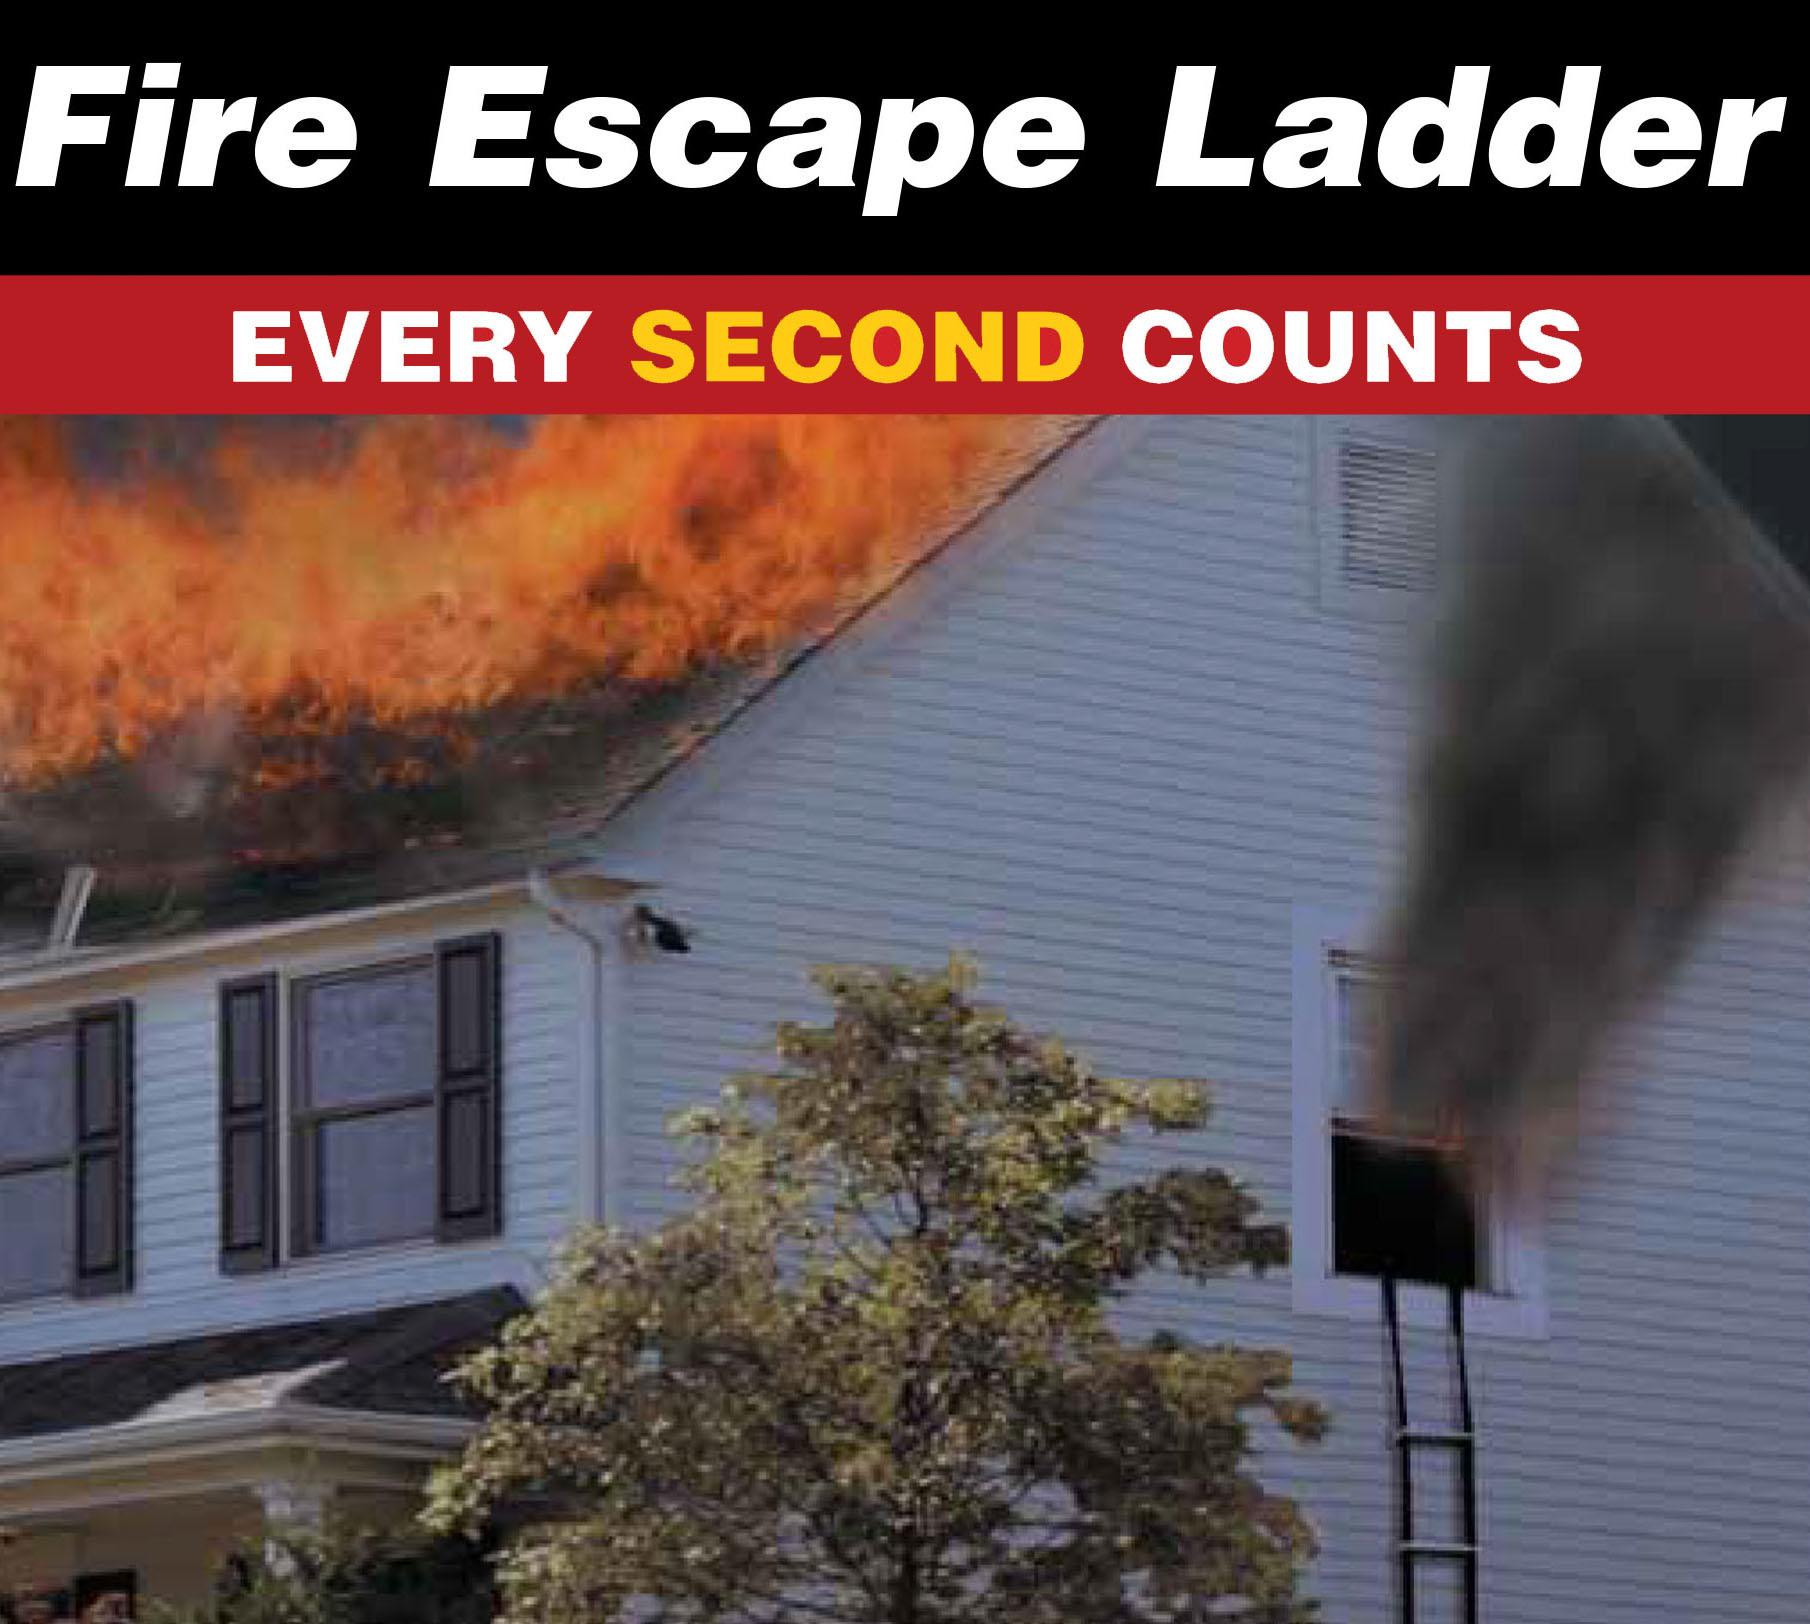 fire-escapeladder-header-v.2.jpg